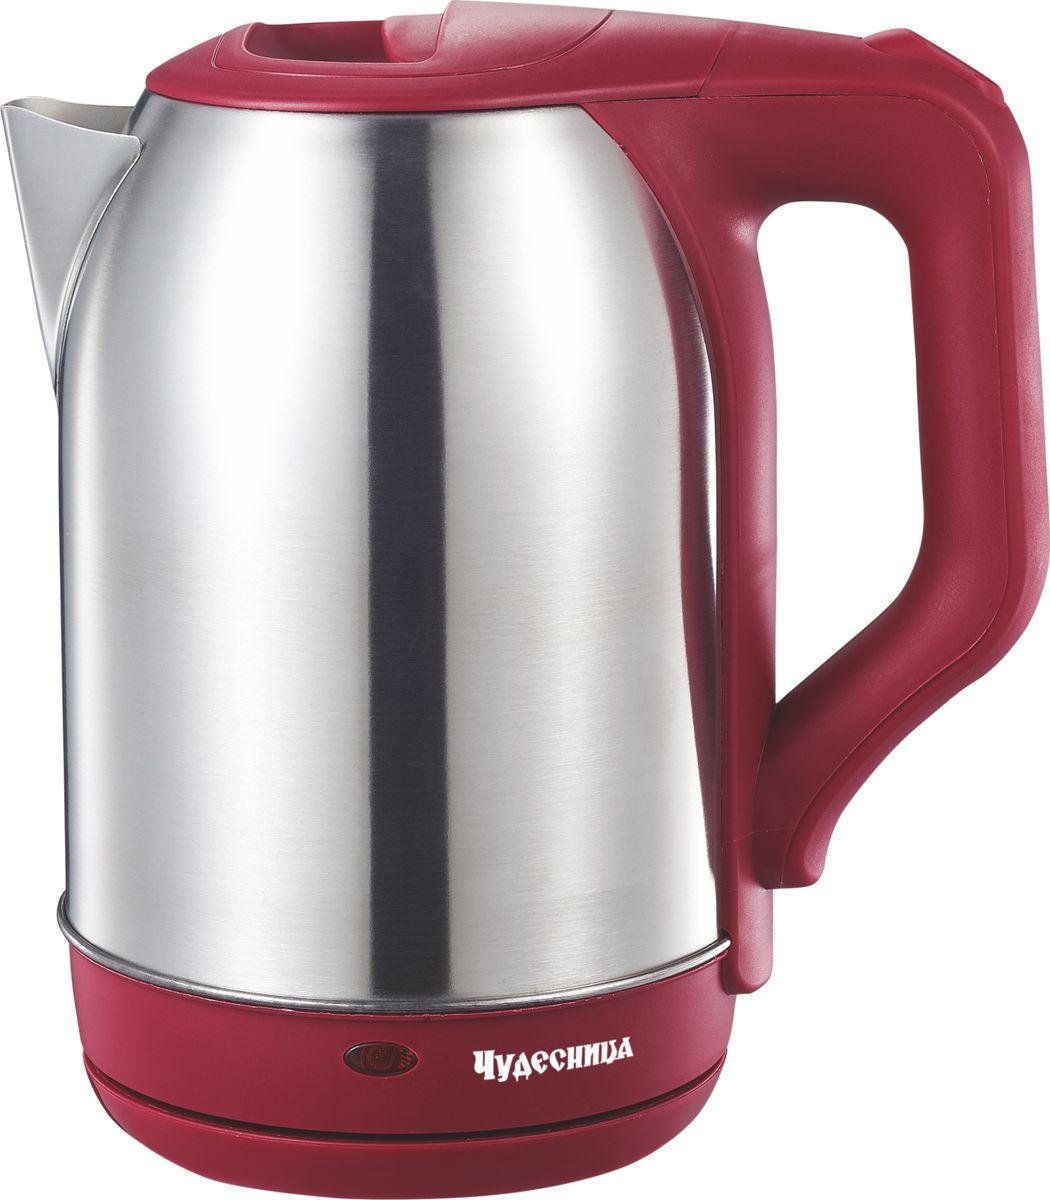 лучшая цена Электрический чайник Чудесница ЭЧ-2023, Red